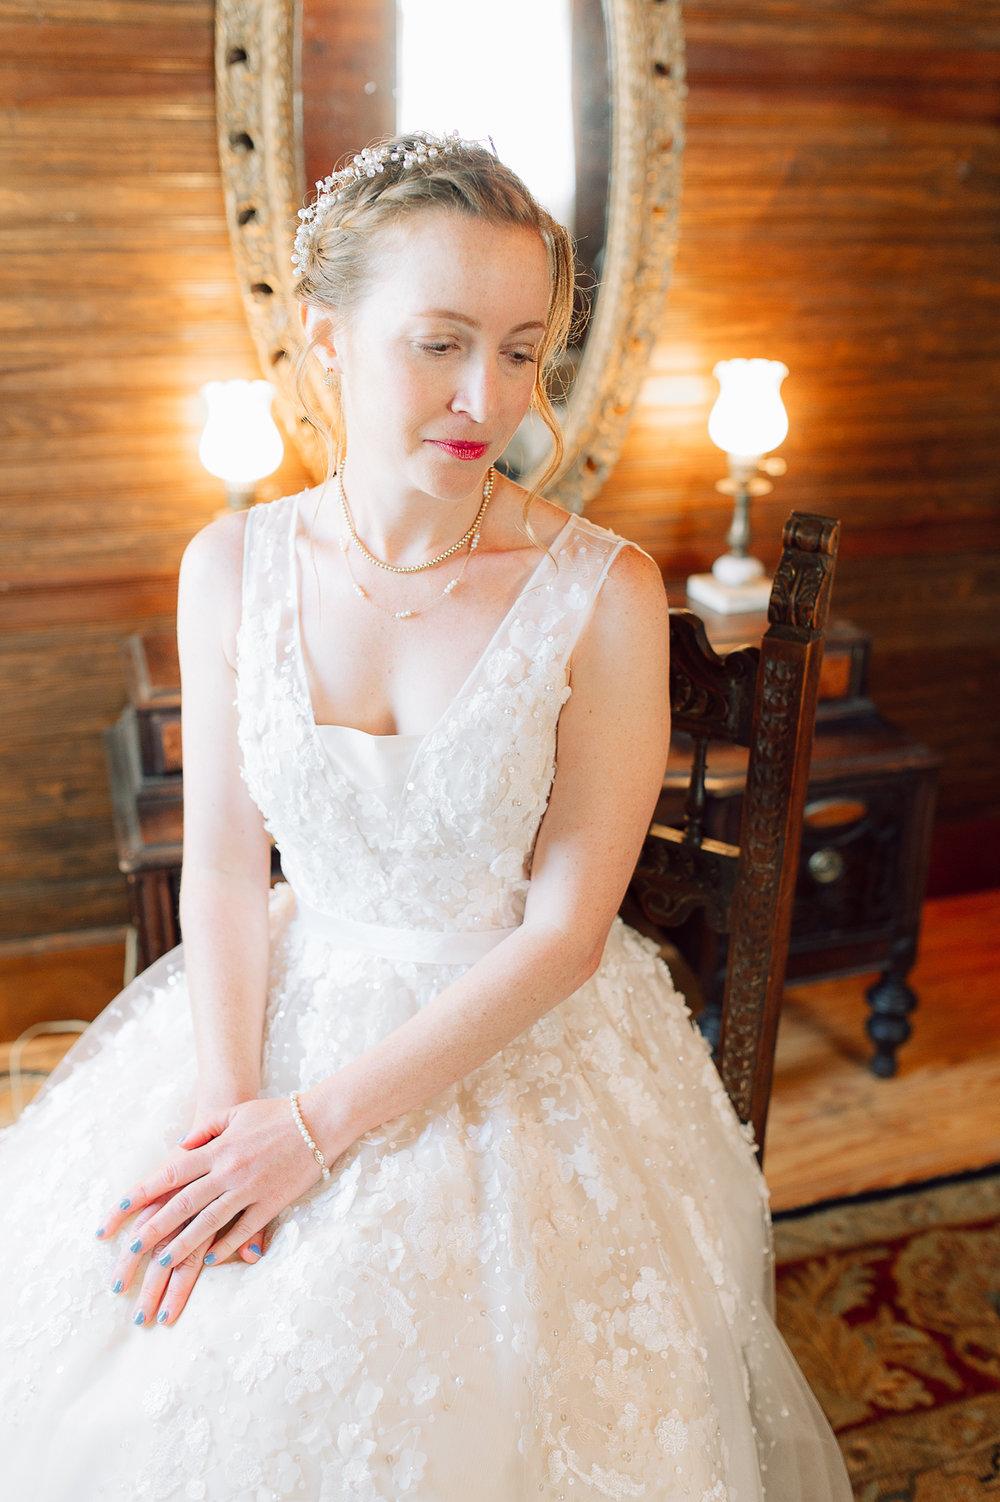 virginiawedding_theGlasgowFarm_rusticwedding_fredericksburg_youseephotography_CarolineDale (22).jpg